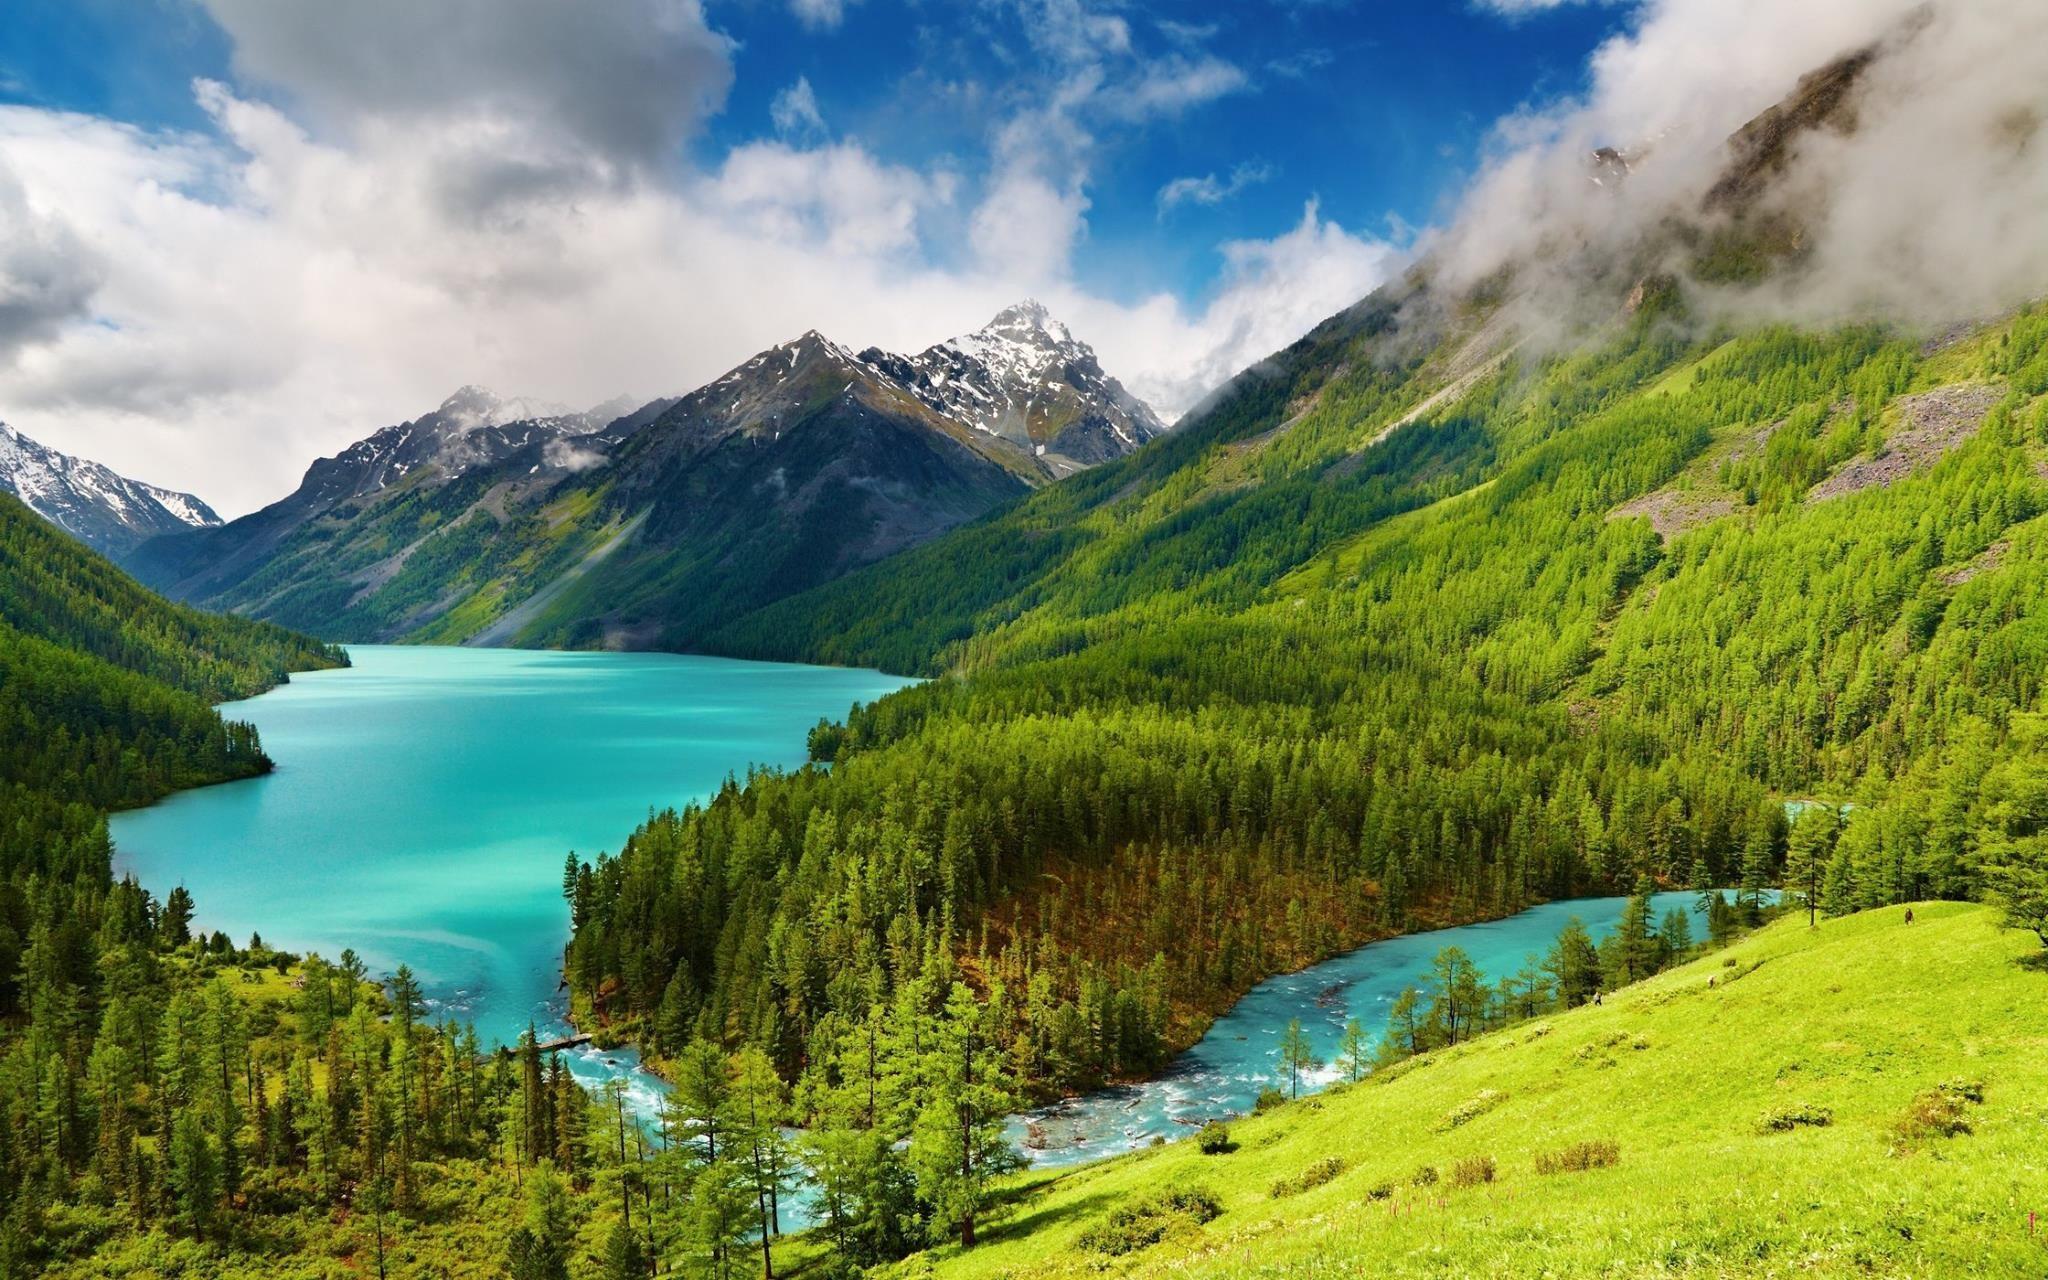 Altay Daglari Nature Hd Scenery Beautiful Nature